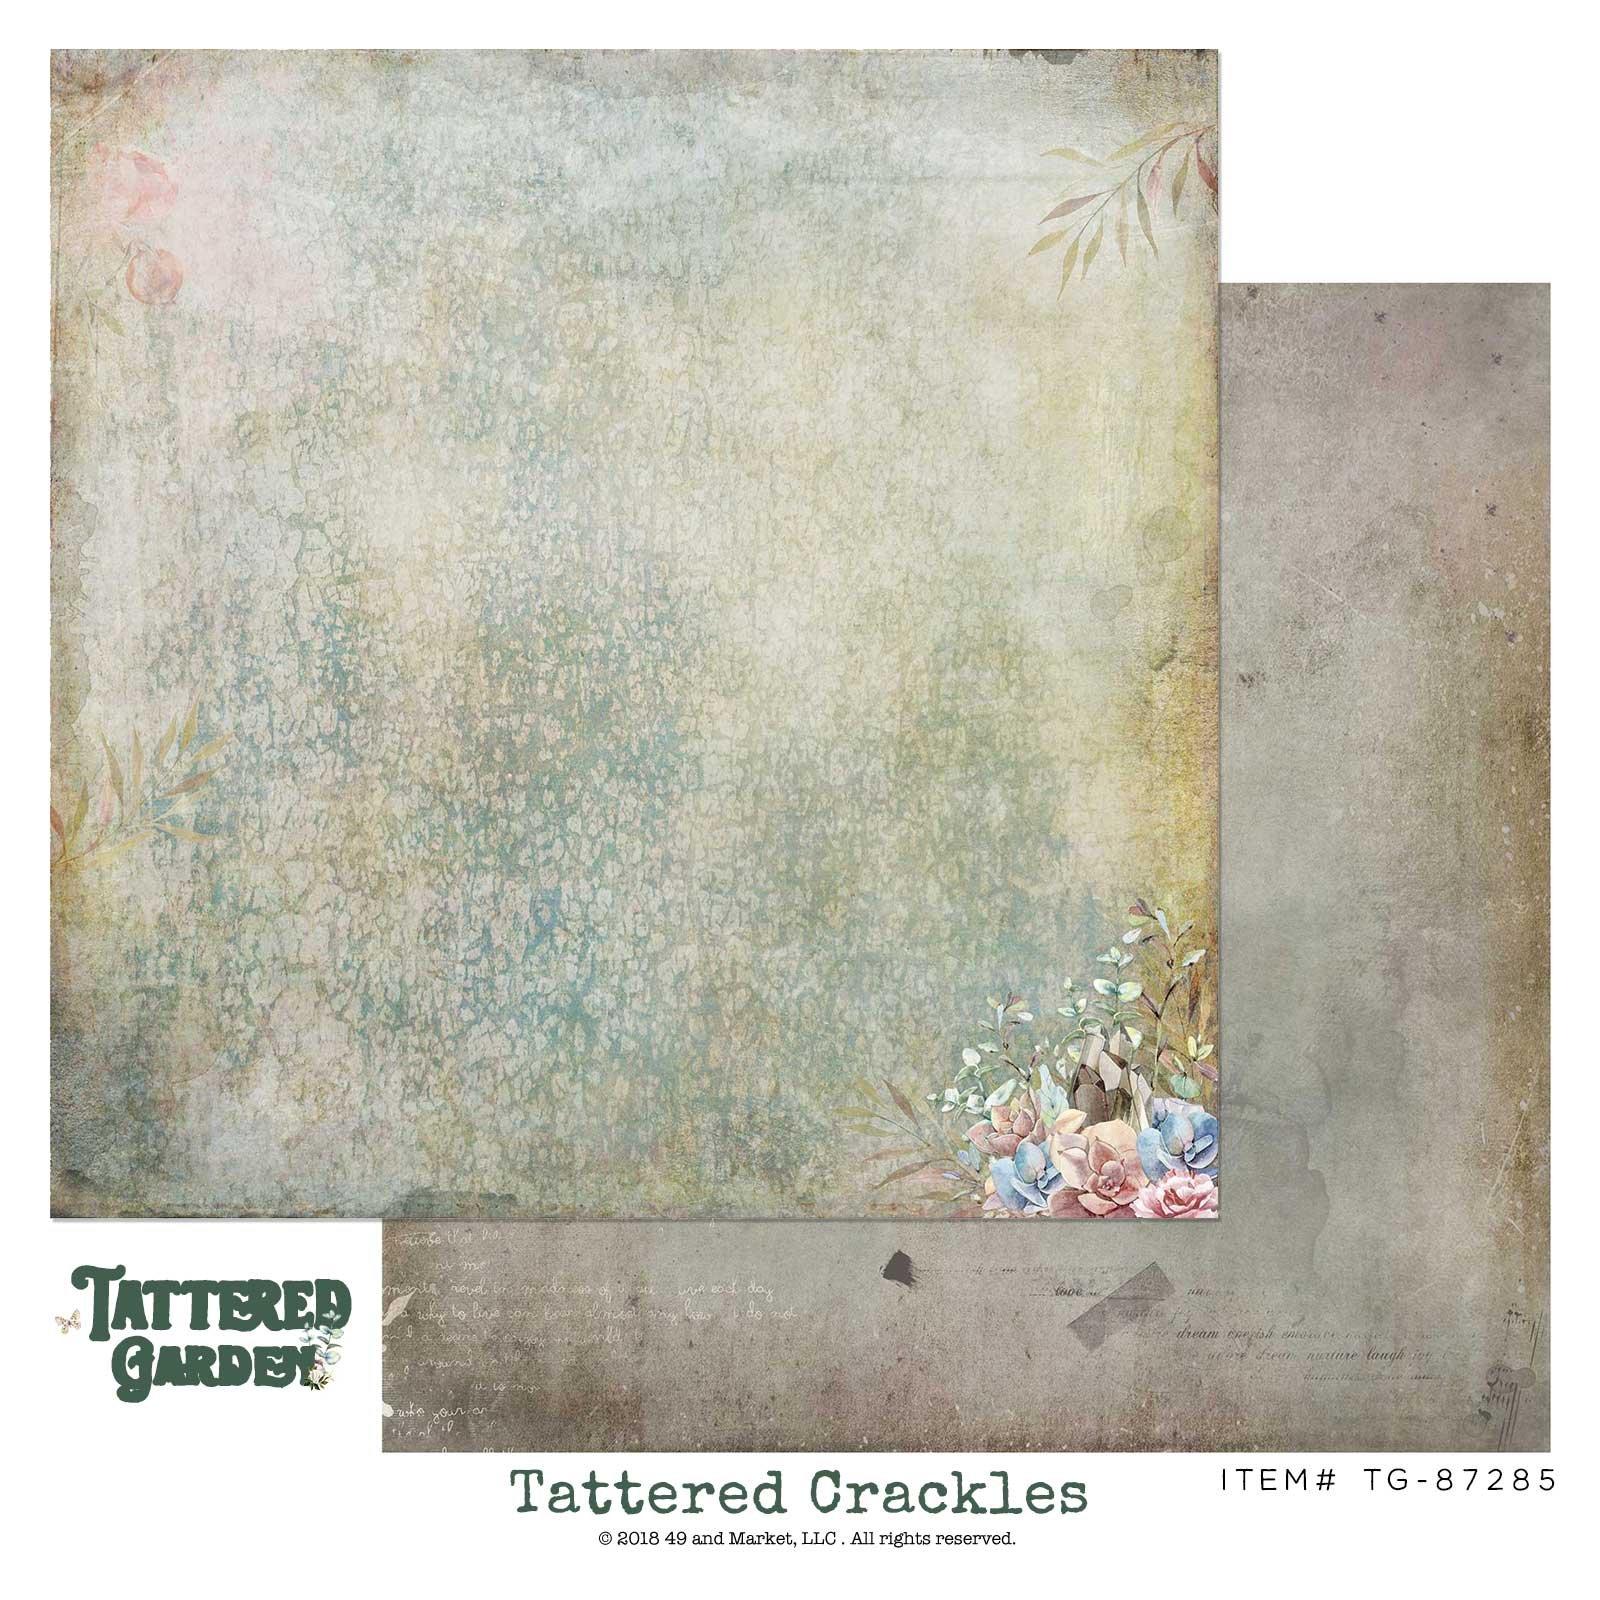 Tattered Crackles